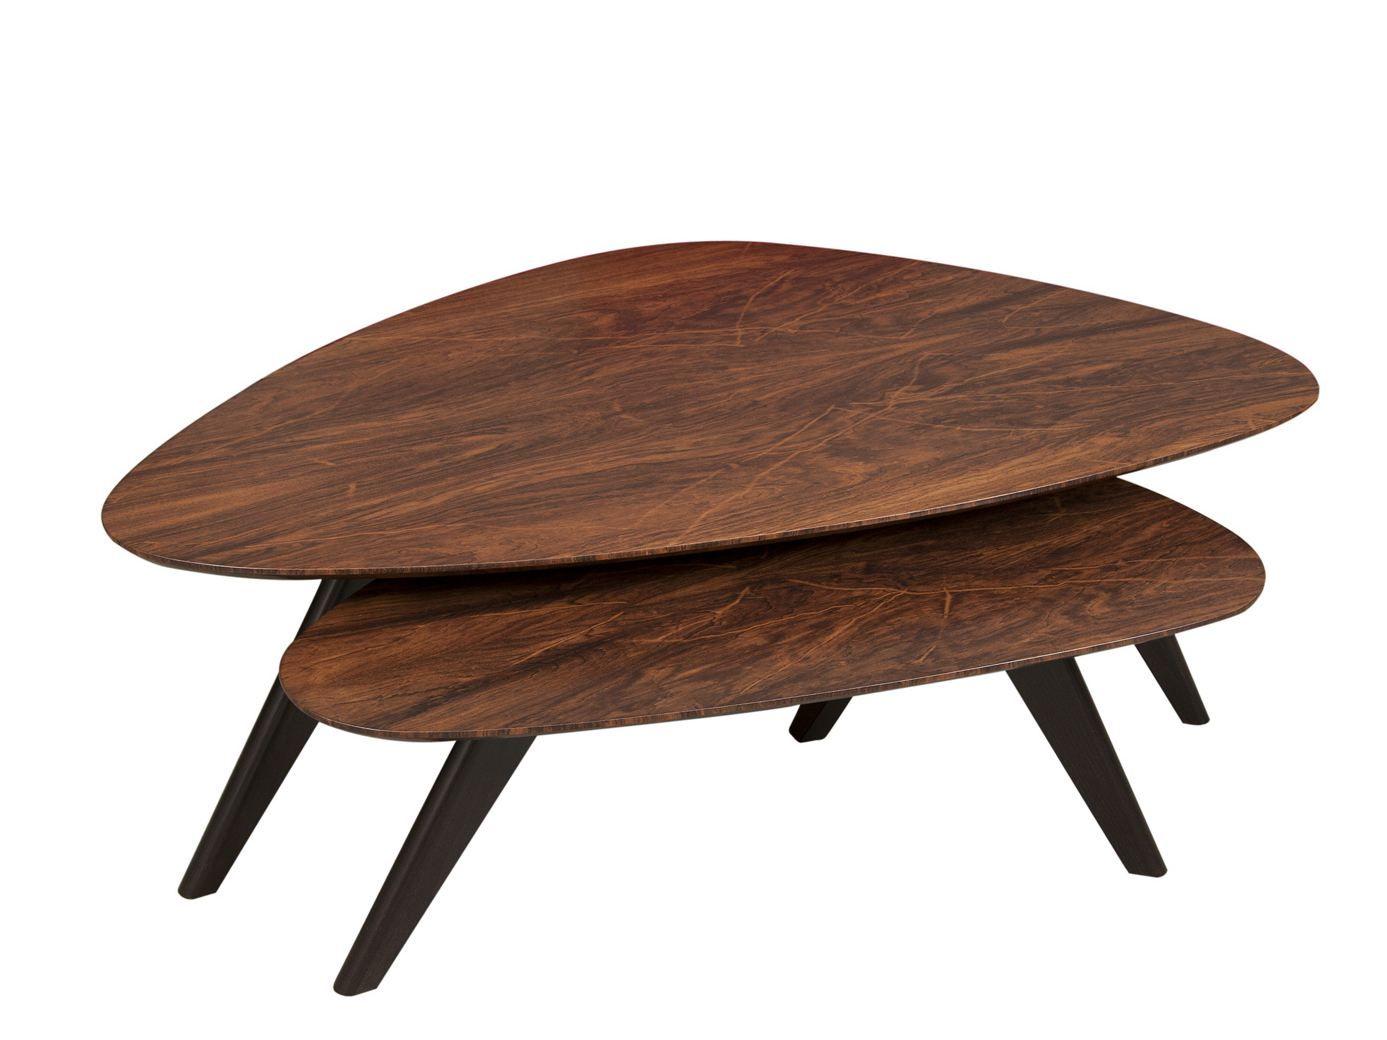 Triangular wooden coffee table jasper by hamilton conte for Paris coffee table